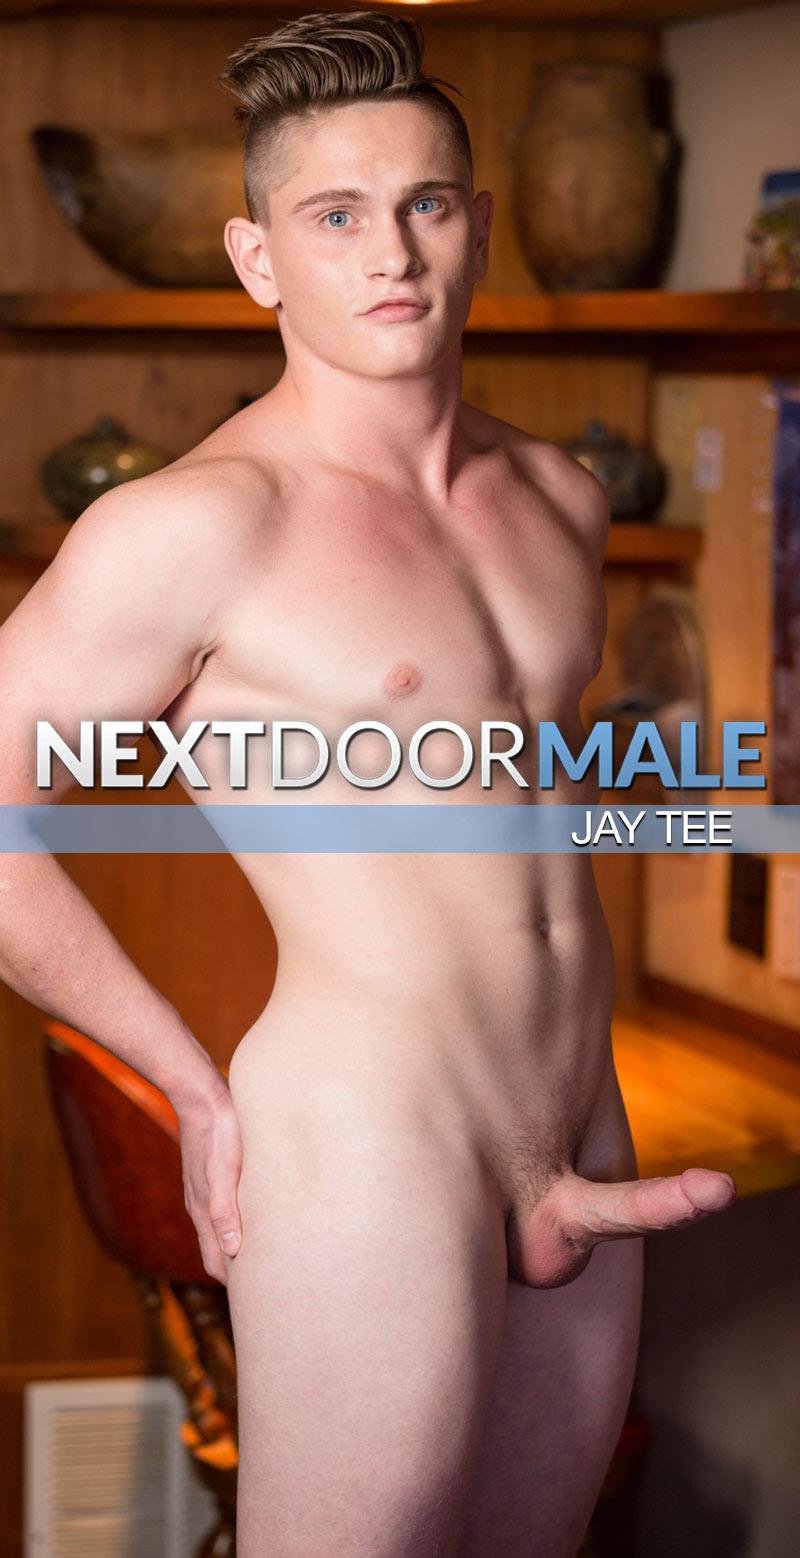 Jay Tee at Next Door Male